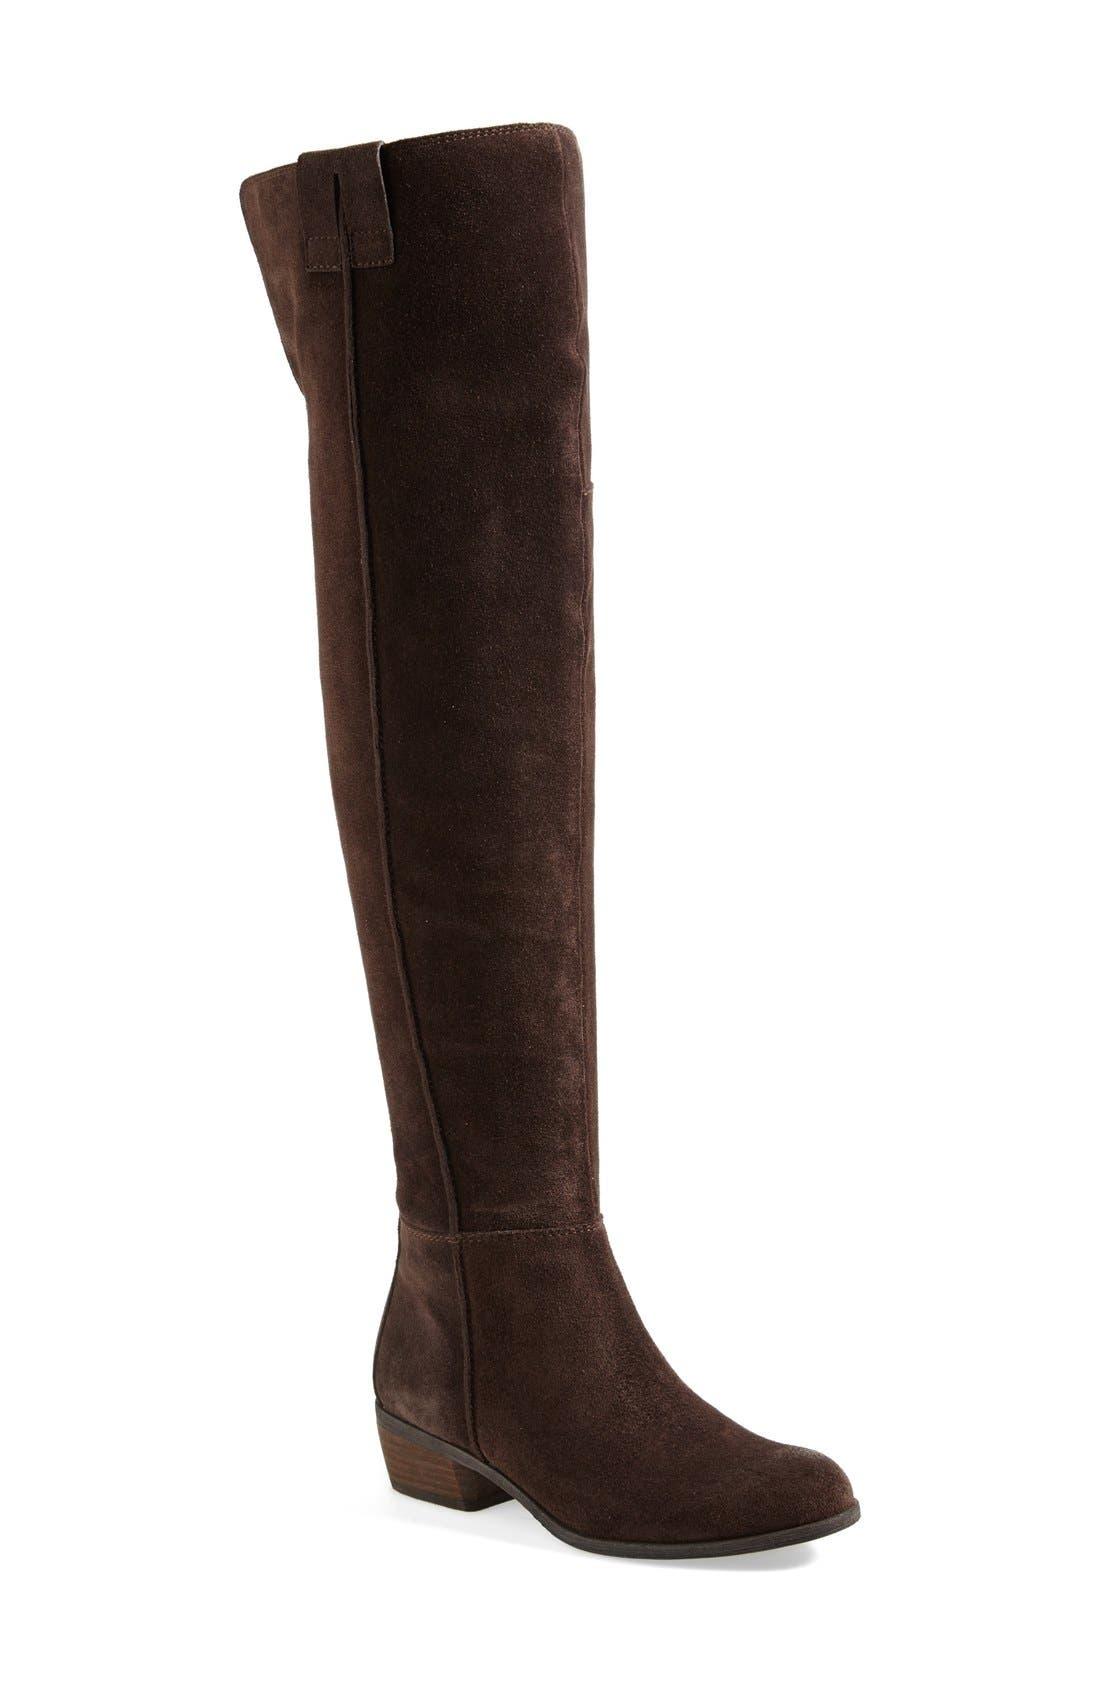 Alternate Image 1 Selected - Sam Edelman 'Johanna' Over the Knee Suede Boot (Women)